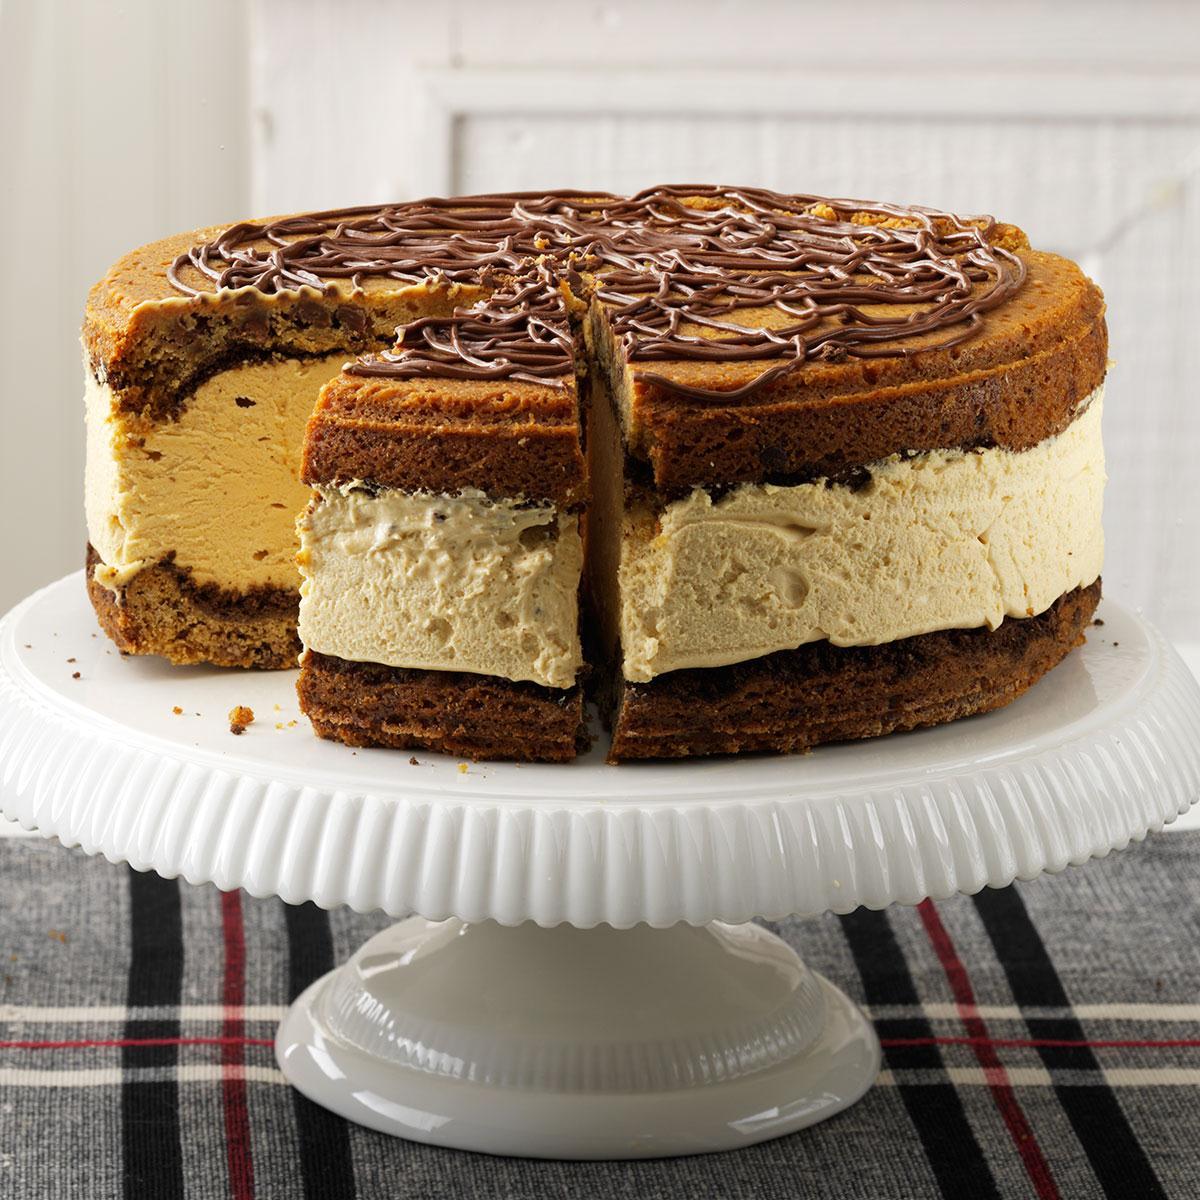 Peanut Butter Dessert Recipes: Giant Peanut Butter Ice Cream Sandwich Recipe